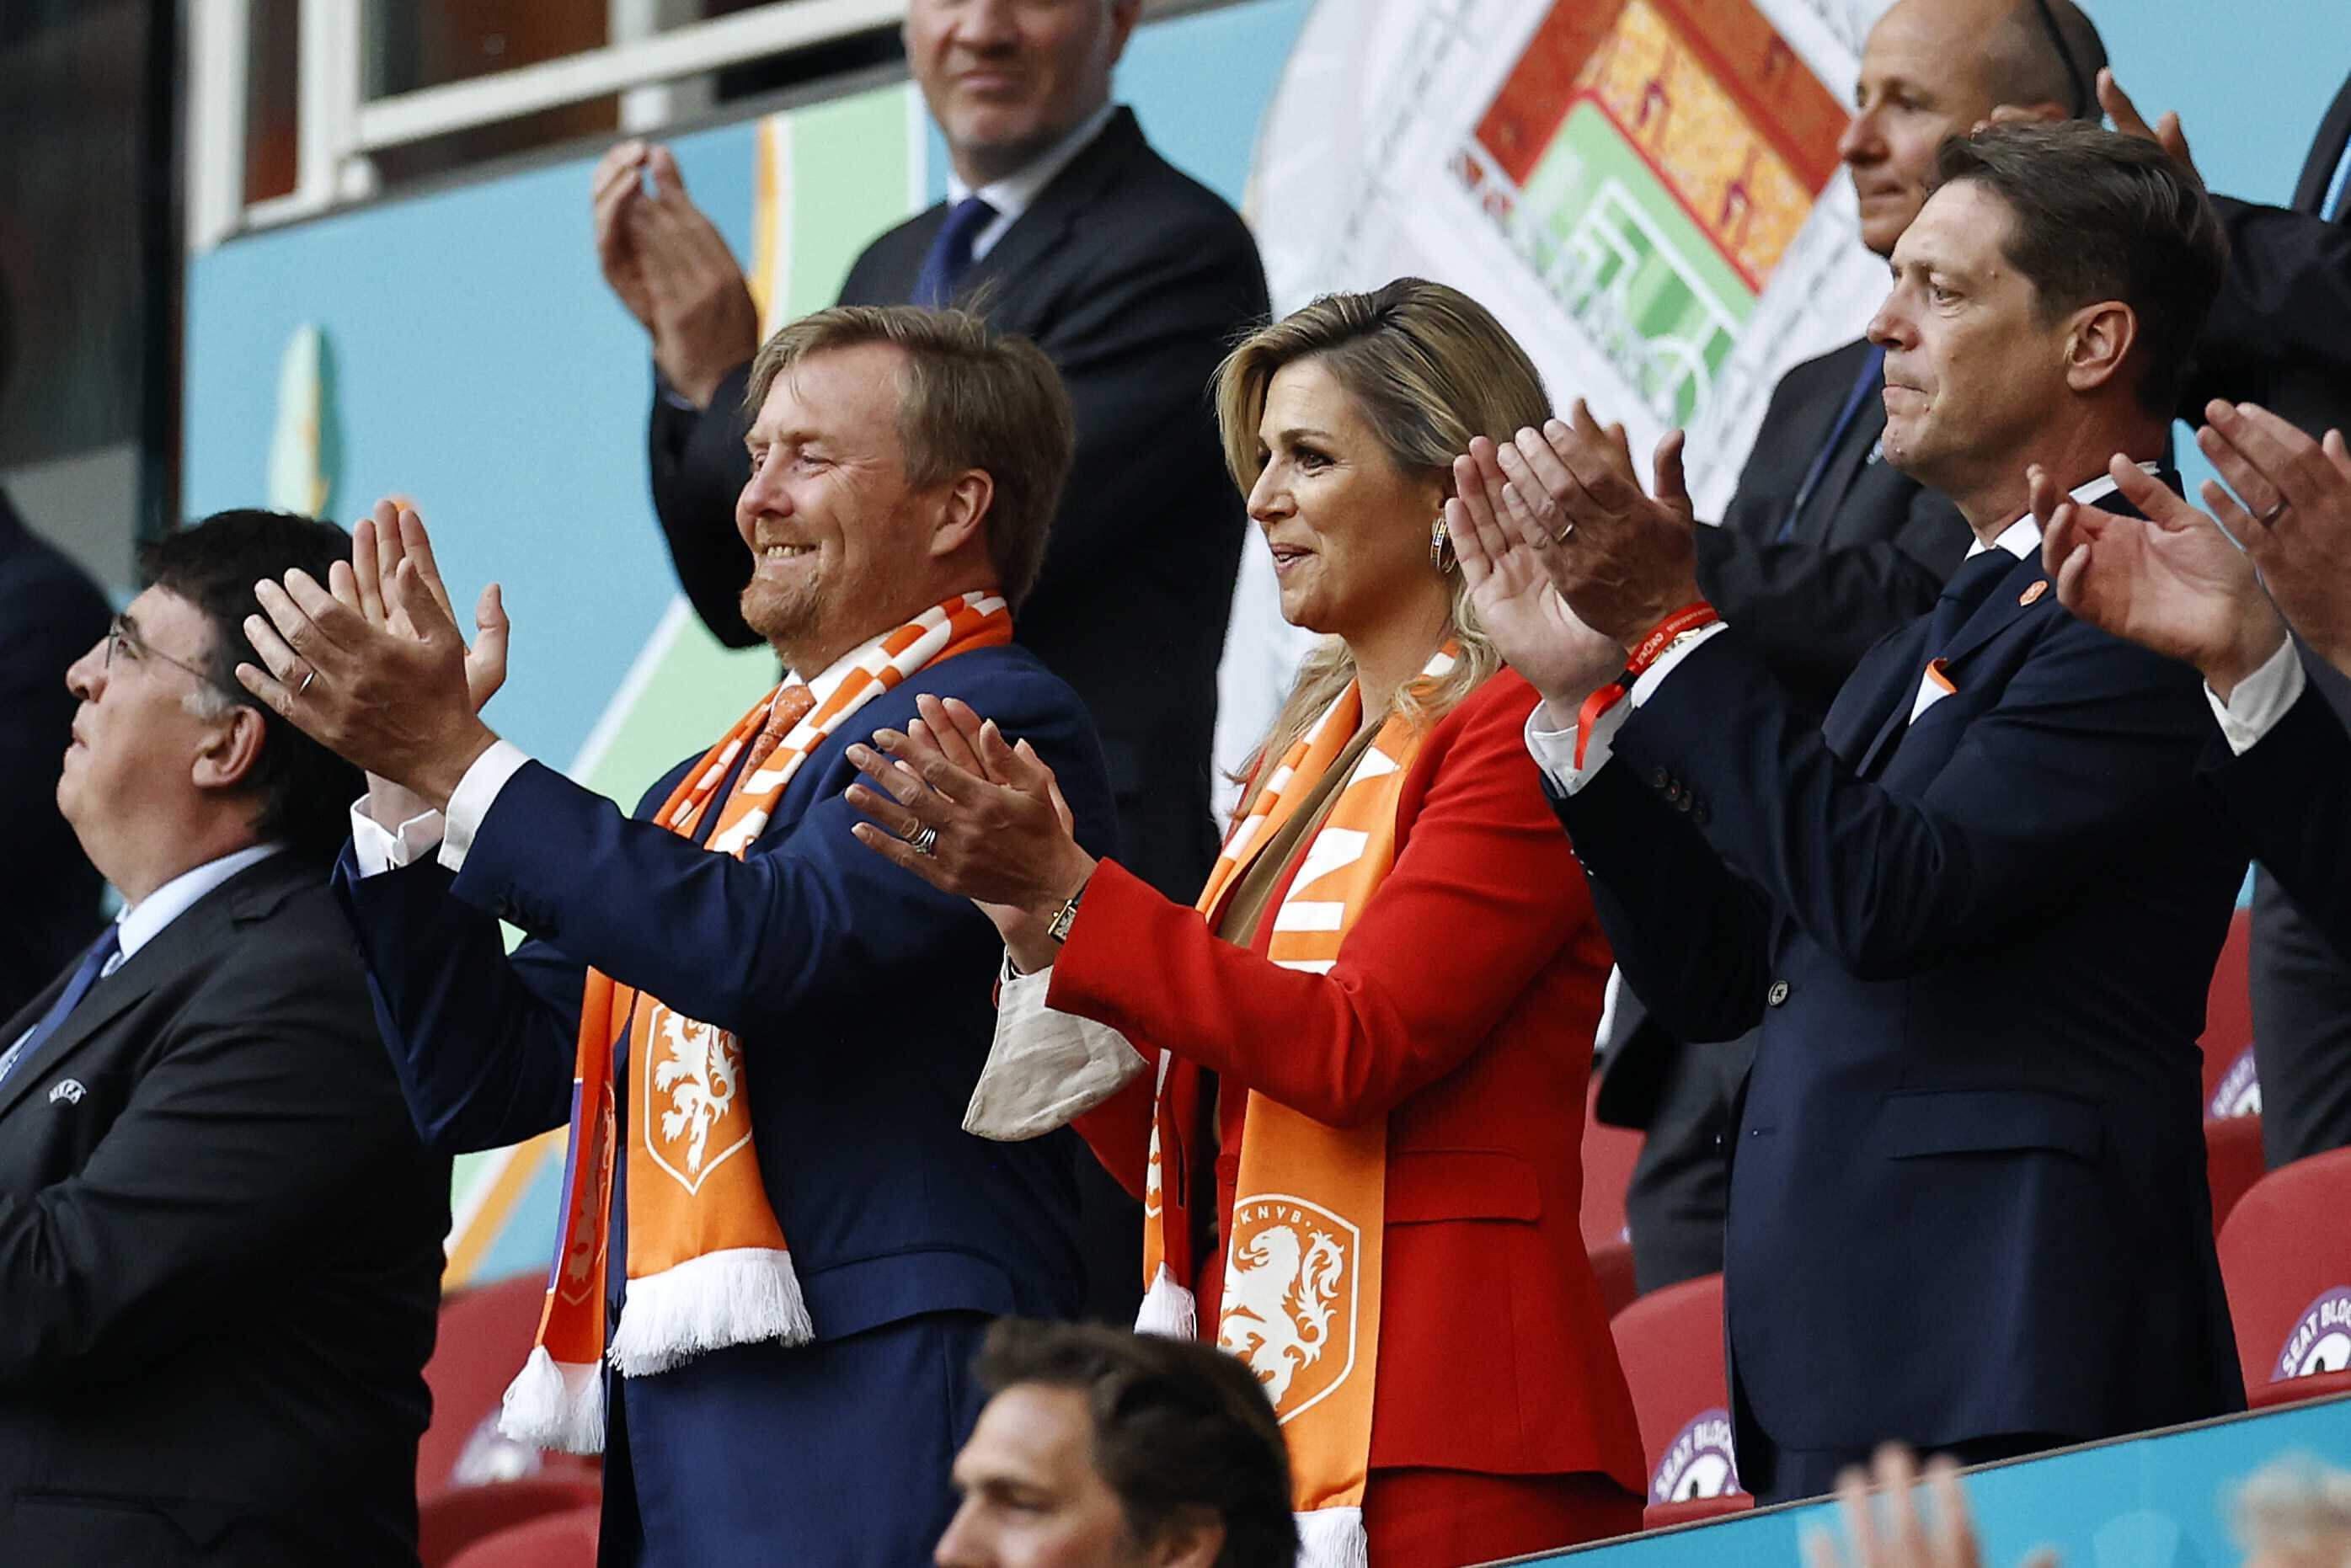 Royals im Fußballfieber: Europameisterschaft 2021